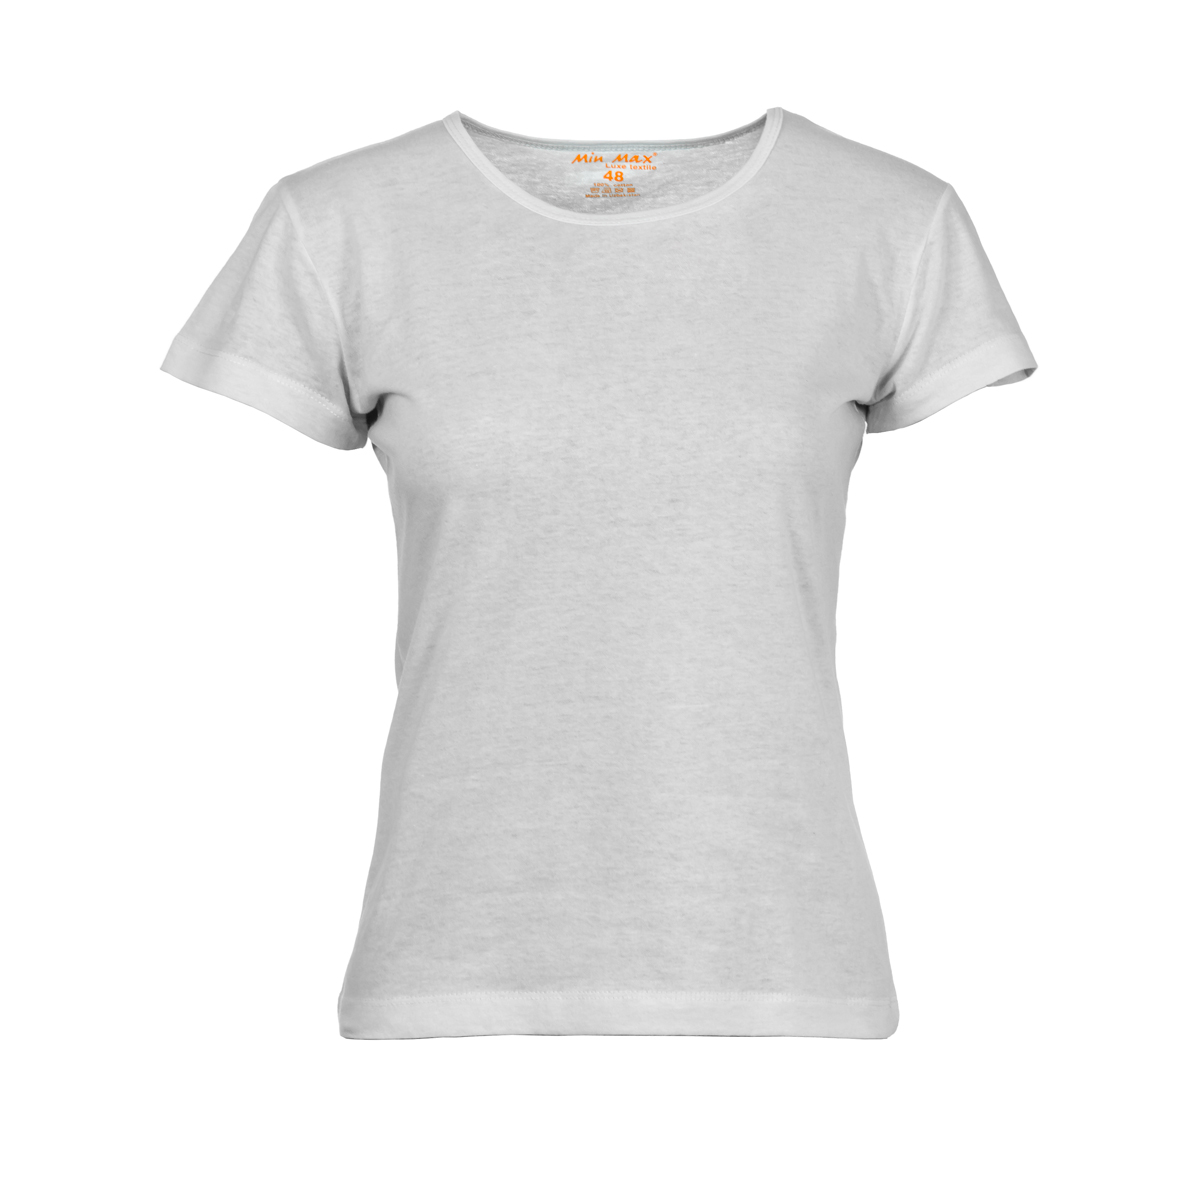 Жен. футболка арт. 04-0052 р. 52Майки и футболки<br>Фактический ОГ:94 см<br>Фактический ОТ:88 см<br>Фактический ОБ:96 см<br>Длина по спинке:60 см<br>Рост:178-188 см<br><br>Тип: Жен. футболка<br>Размер: 52<br>Материал: Кулирка